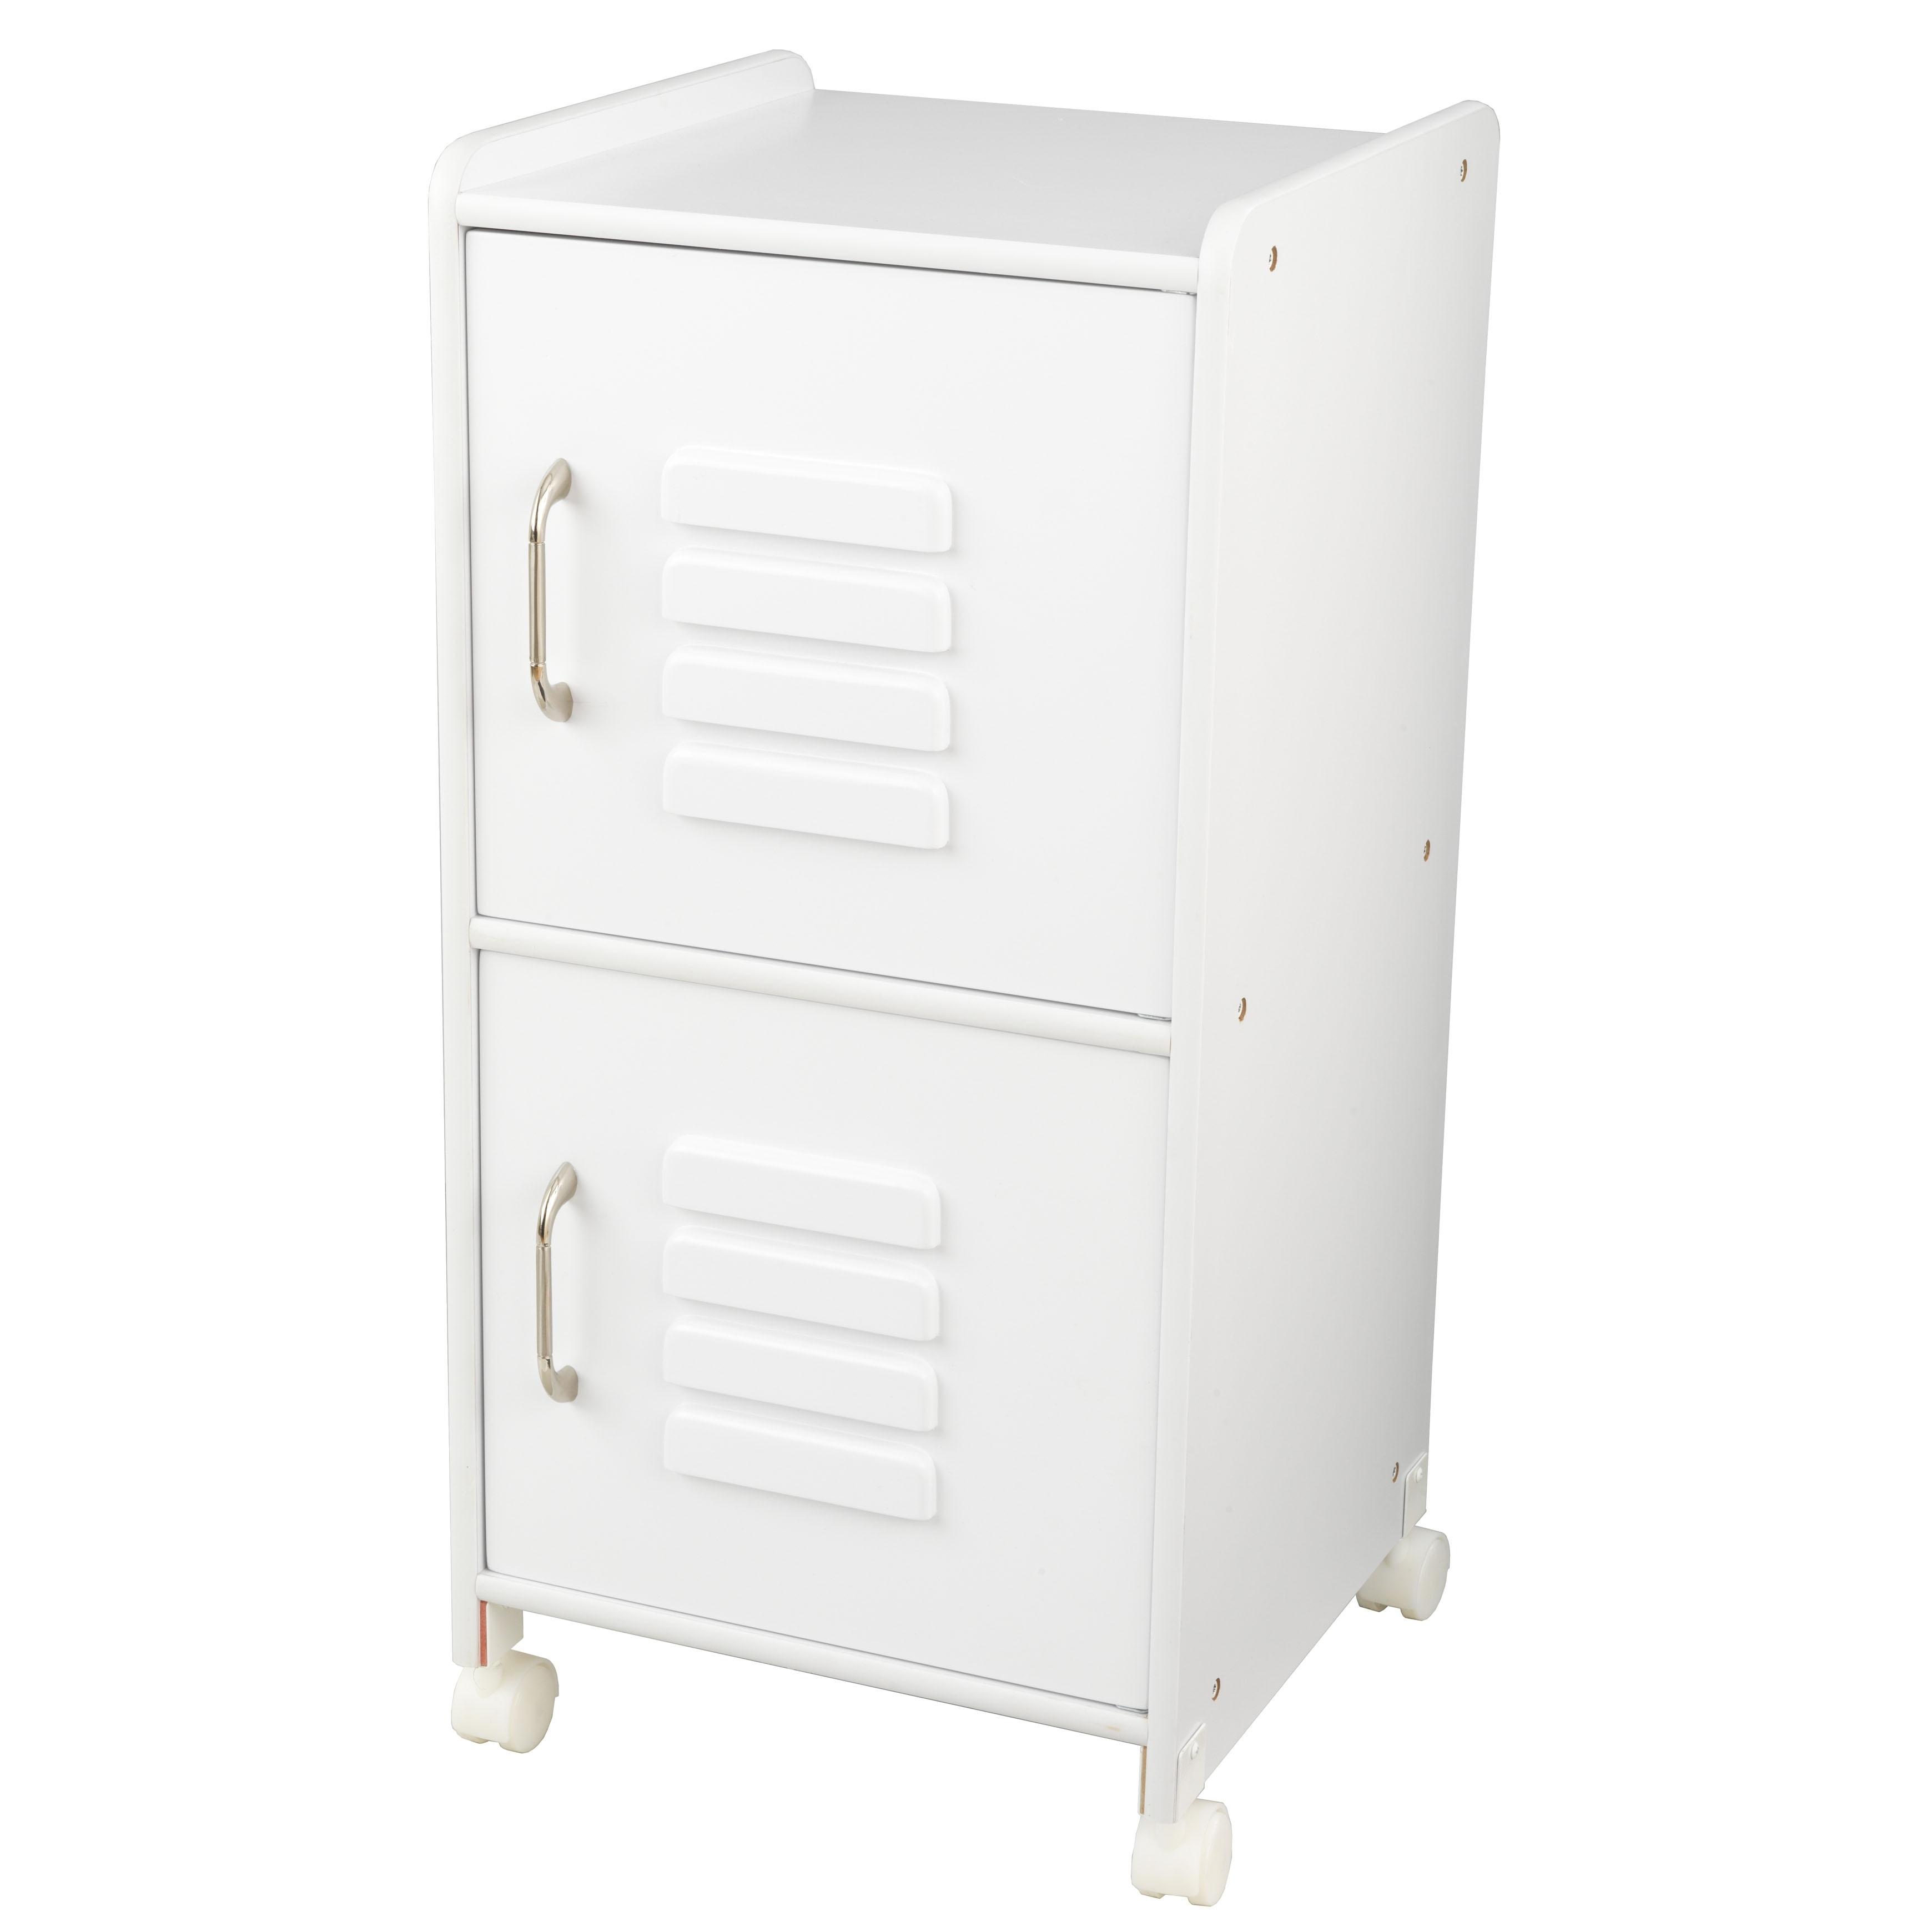 KidKraft: Medium Locker - White